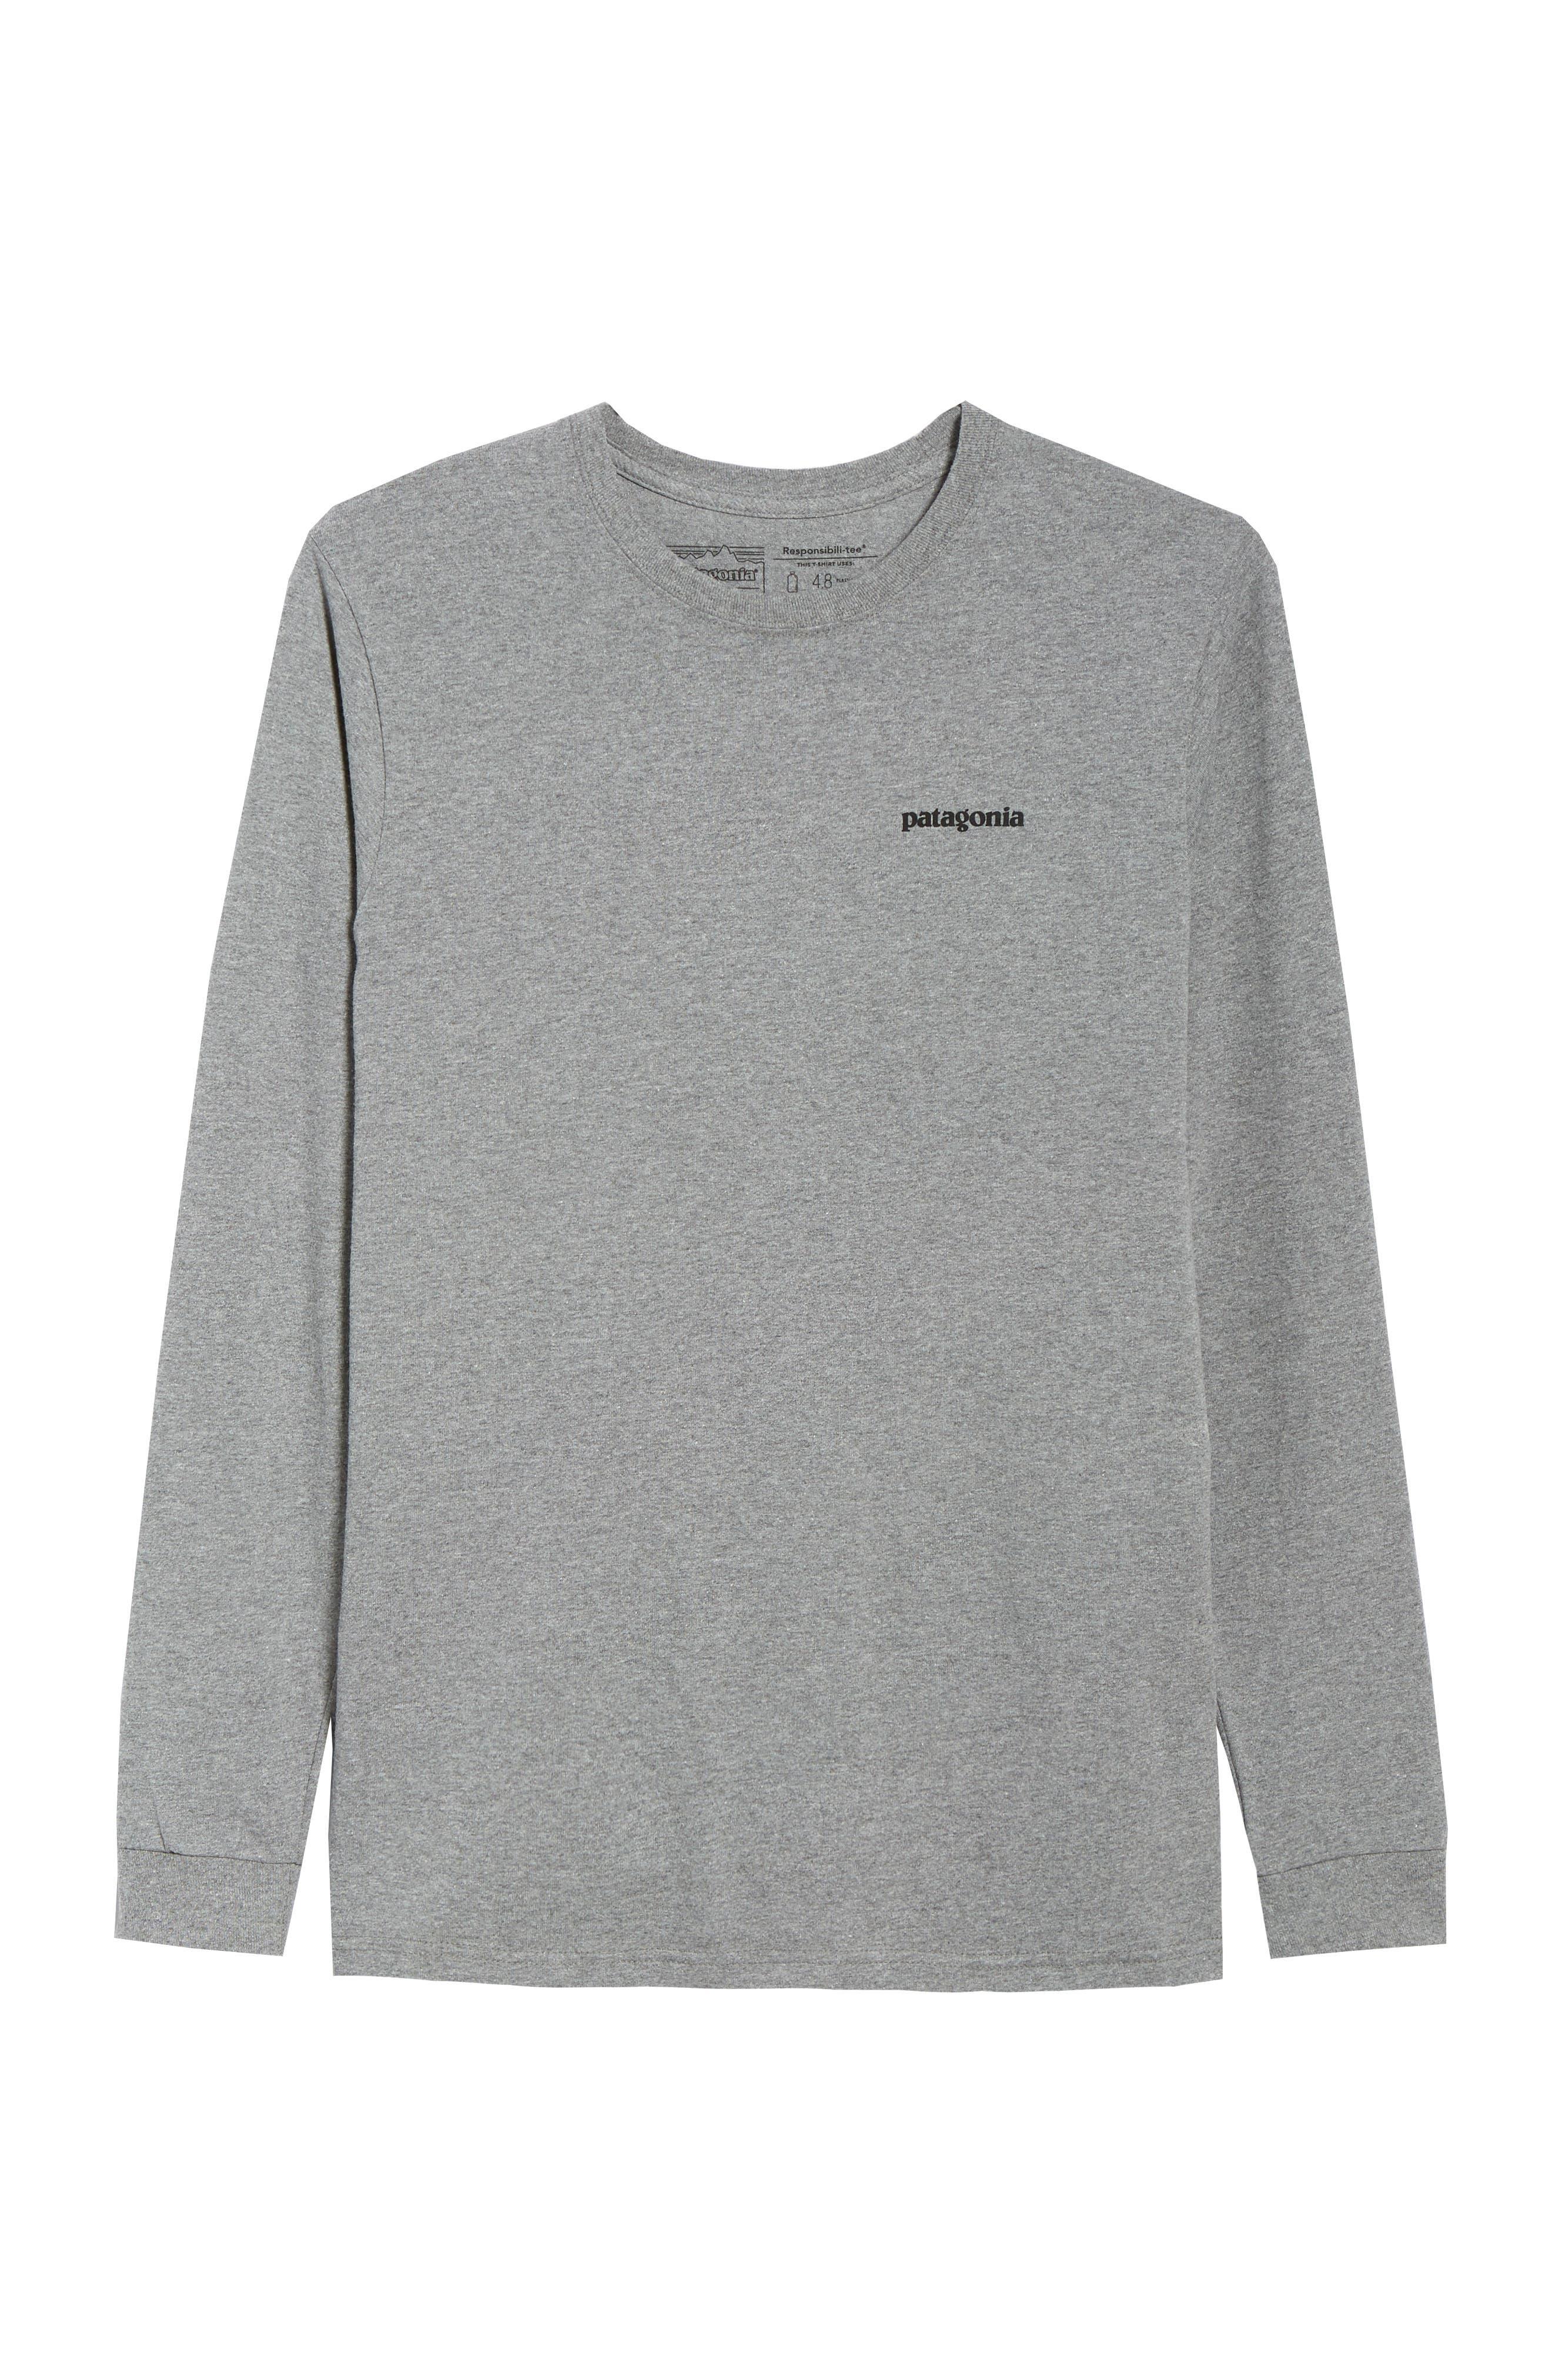 PATAGONIA,                             Fitz Roy Responsibili-Tee Long-Sleeve T-Shirt,                             Alternate thumbnail 6, color,                             020